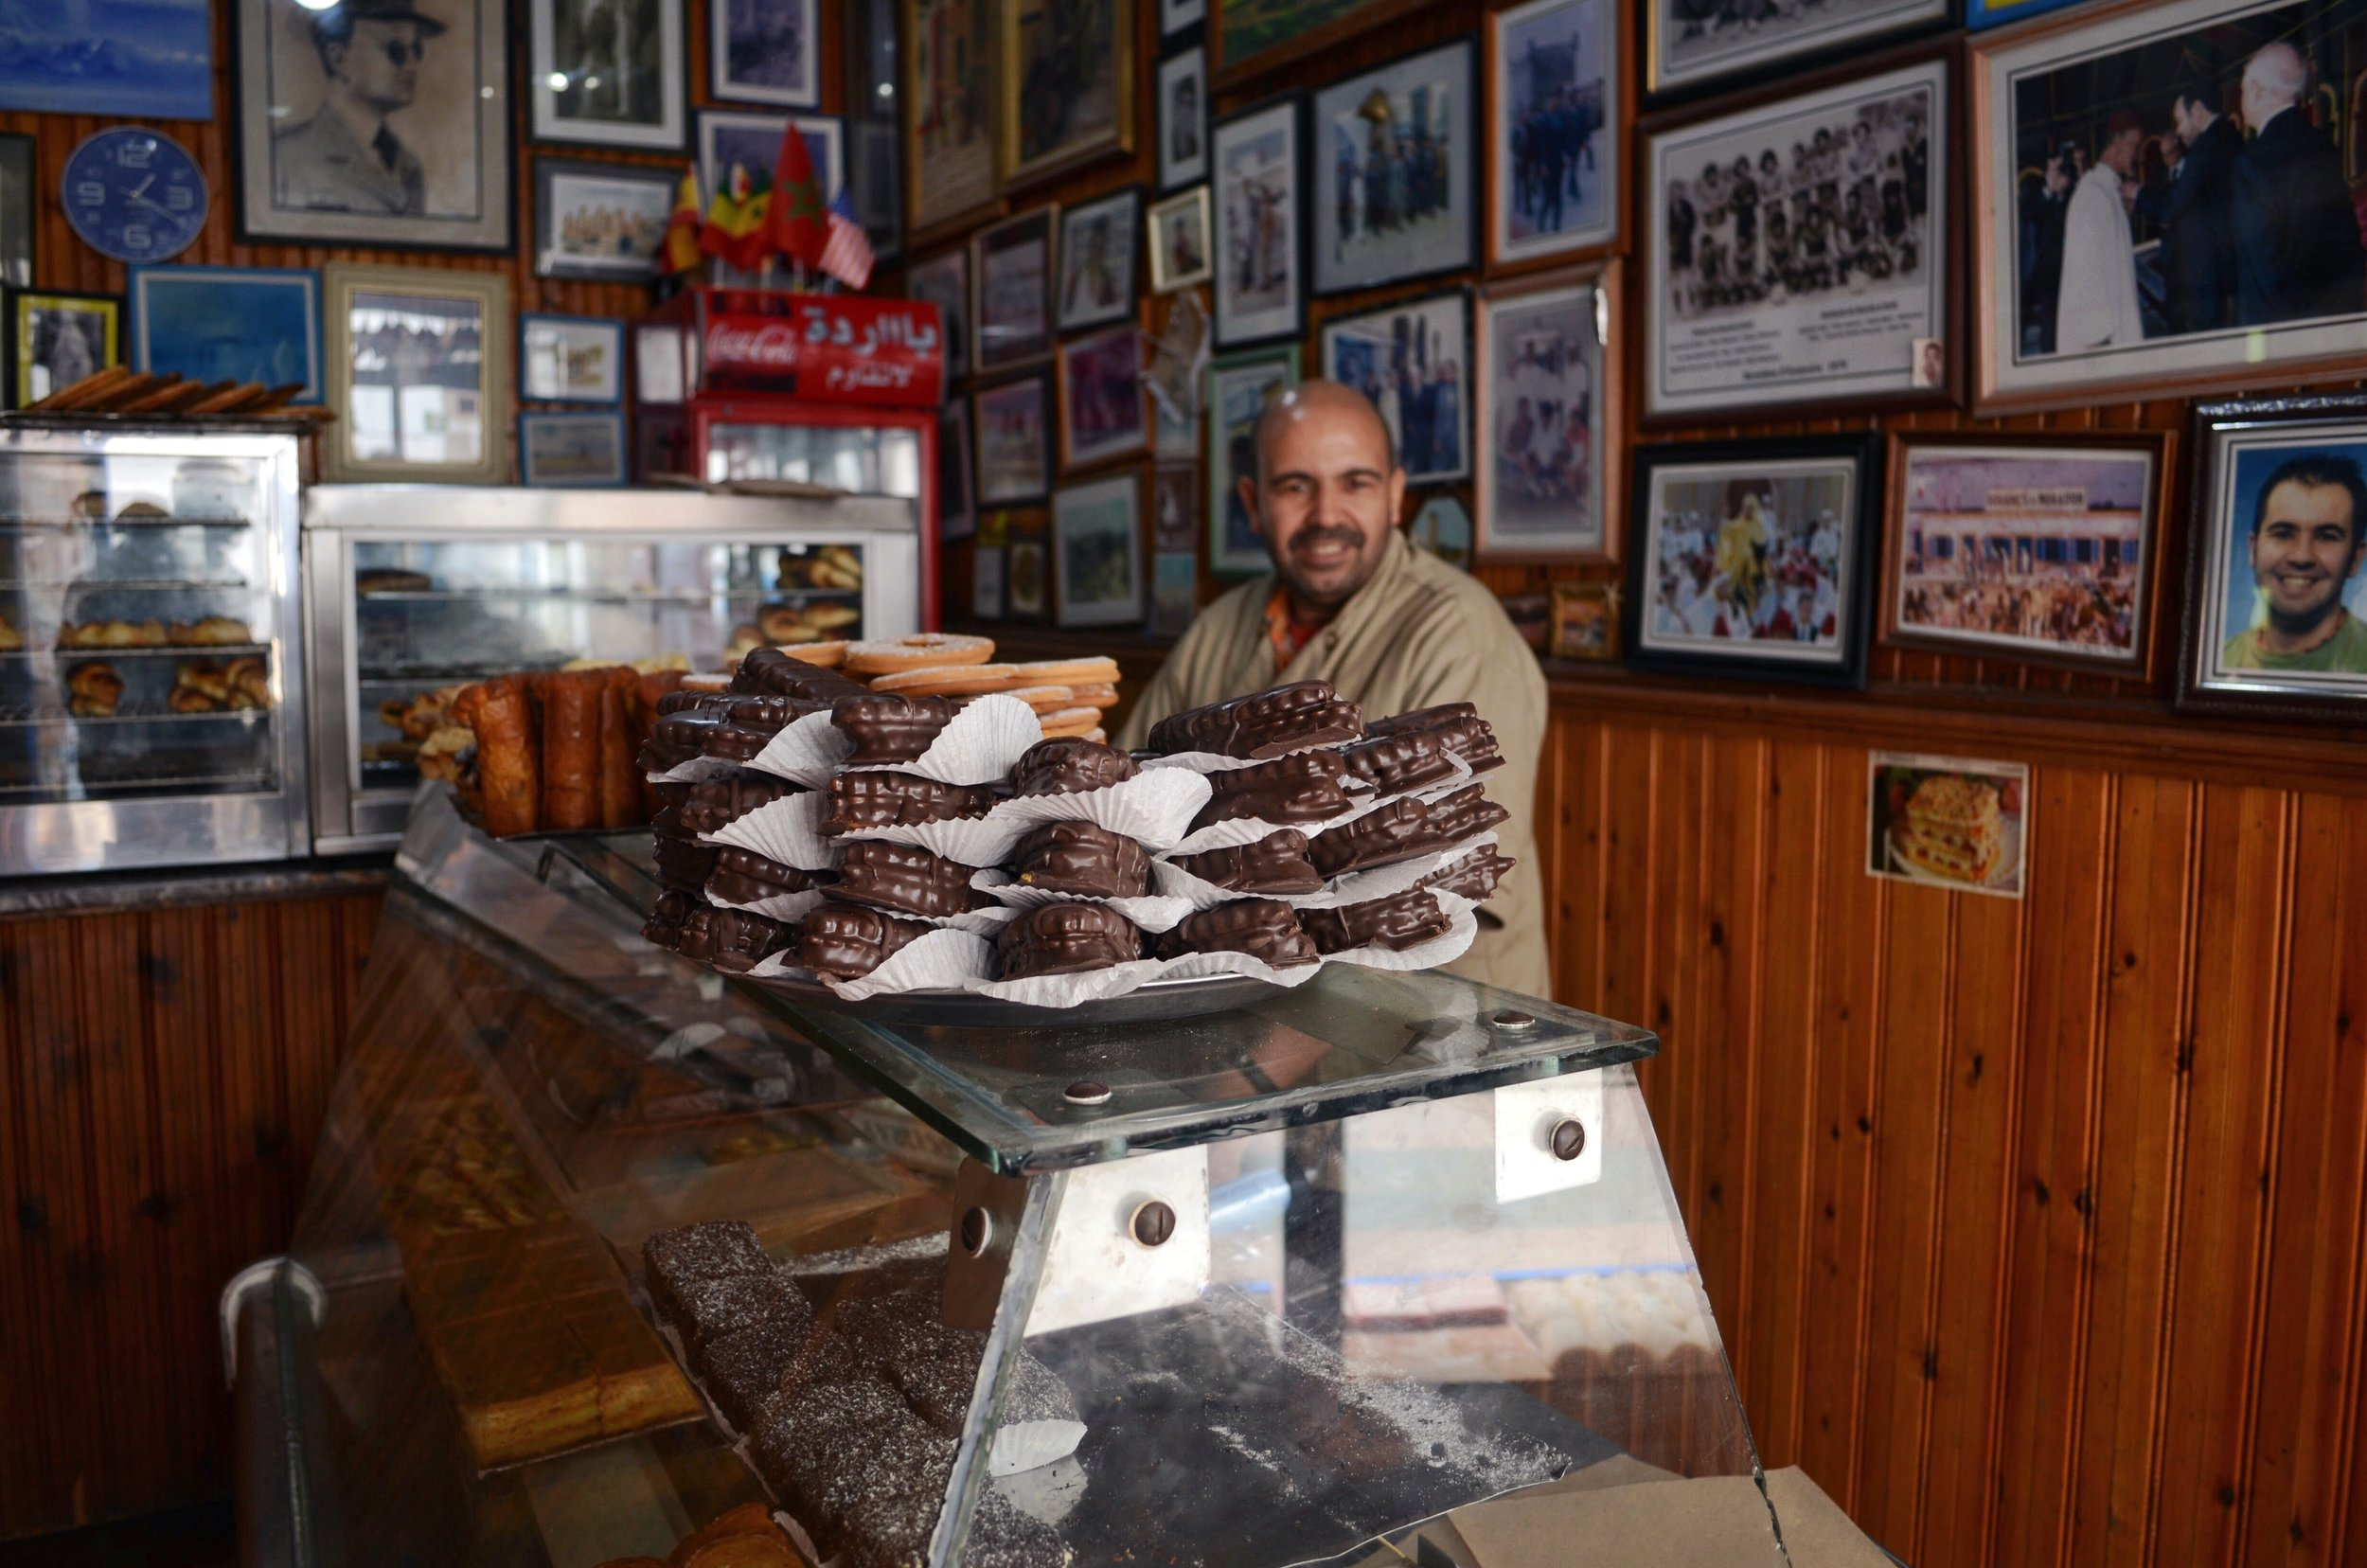 Morocco-Essaouira-Medina-Lunch-Cake